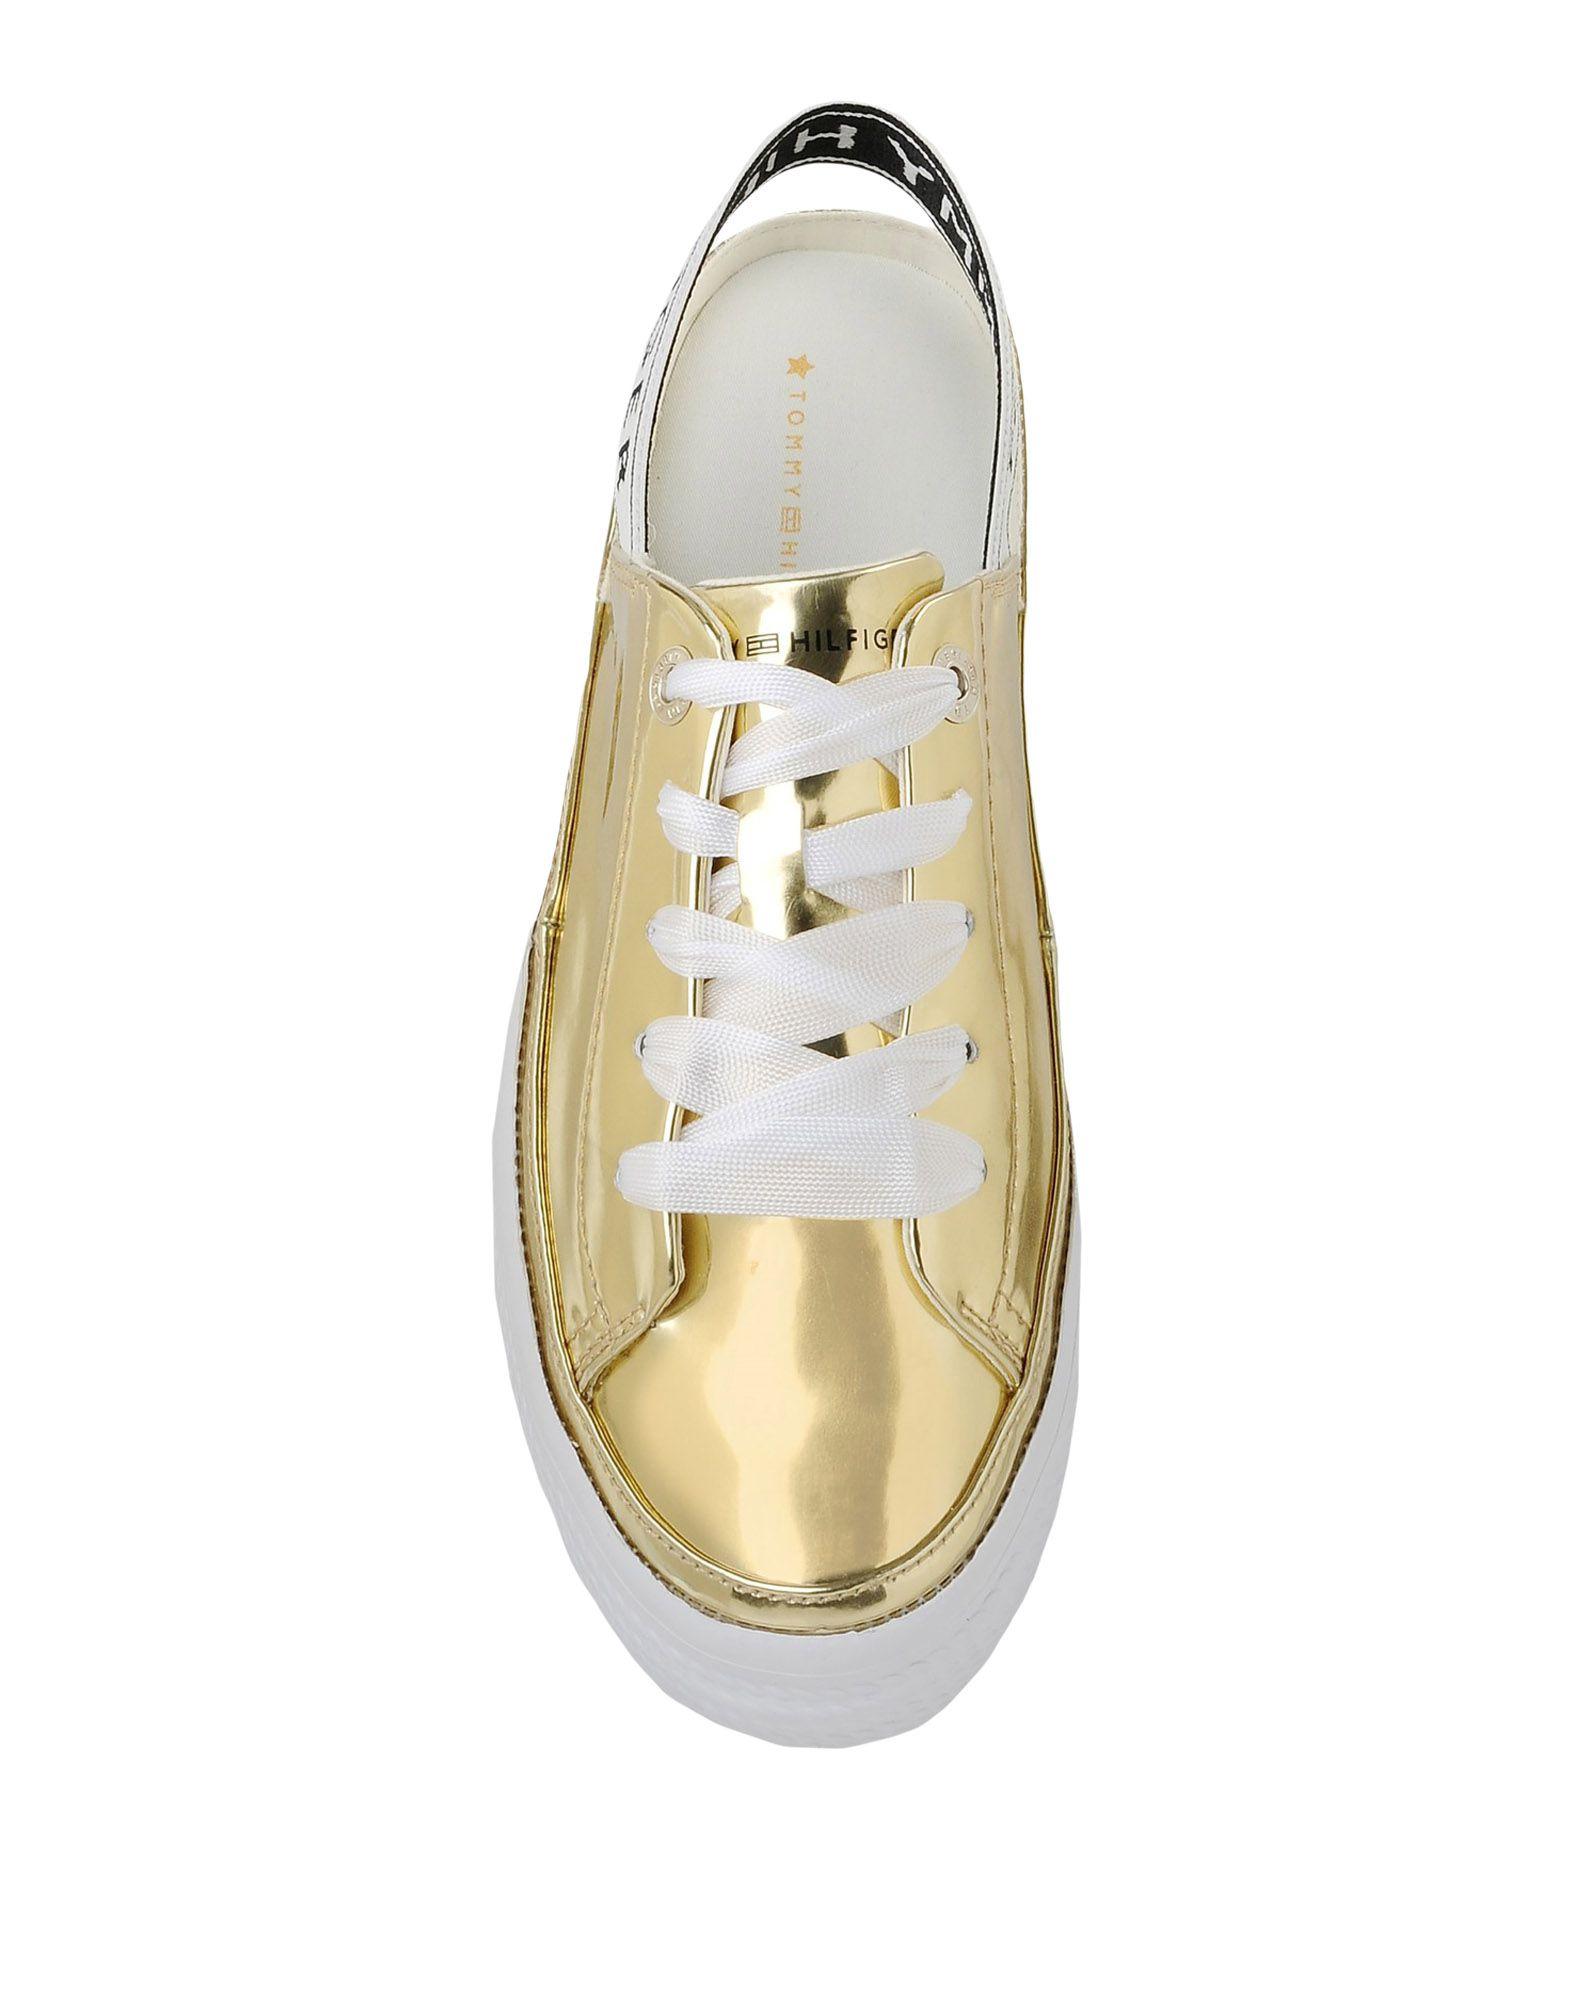 Tommy Hilfiger Mirror  Metal Sling Back Flatf.  Mirror 11539431KP Gute Qualität beliebte Schuhe 6acd44